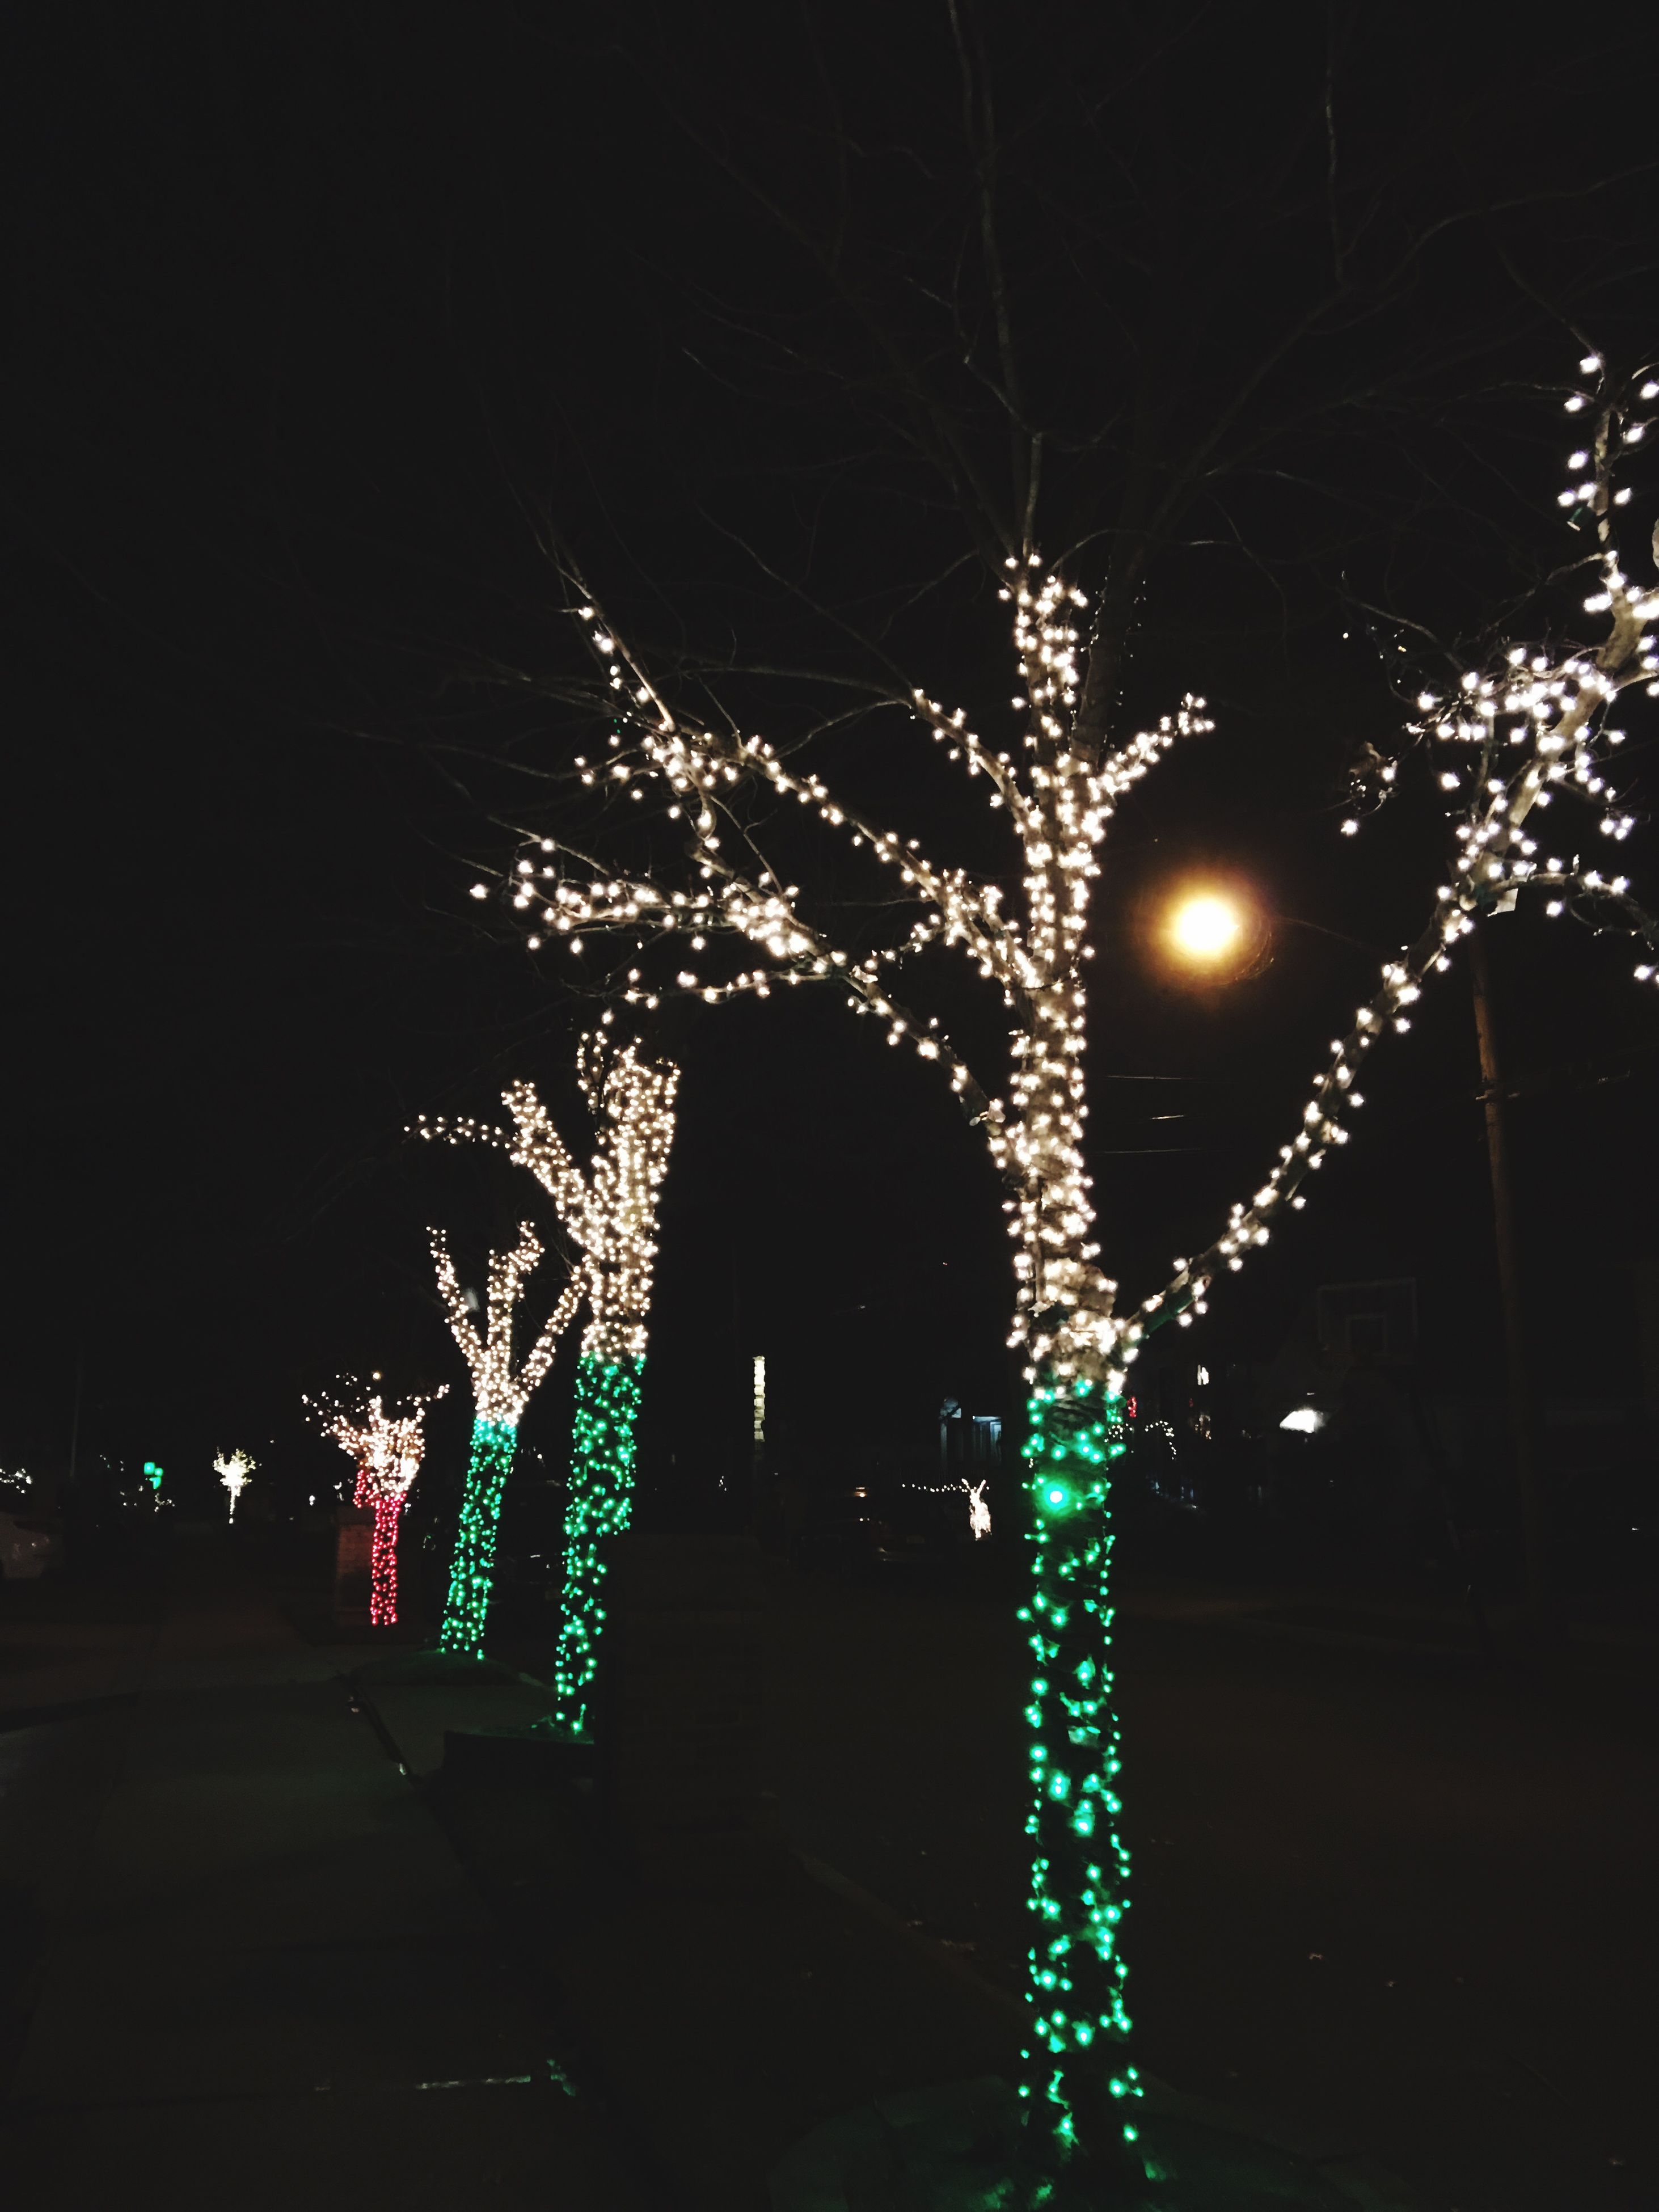 illuminated, night, celebration, christmas lights, lighting equipment, tree, no people, christmas, christmas decoration, christmas tree, outdoors, city, firework - man made object, sky, firework